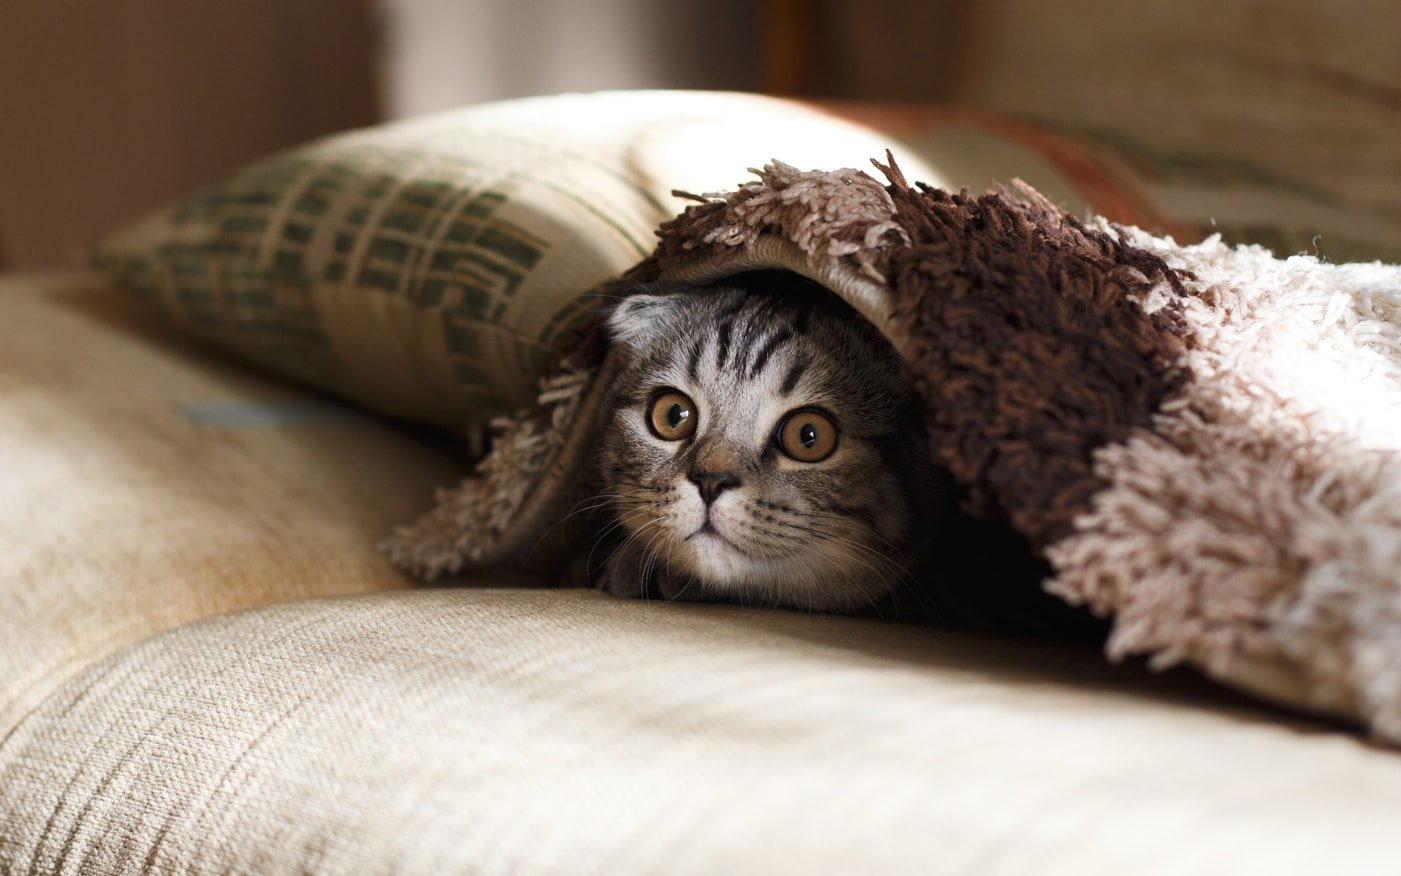 Should I Elevate My Cat's Food Bowl?